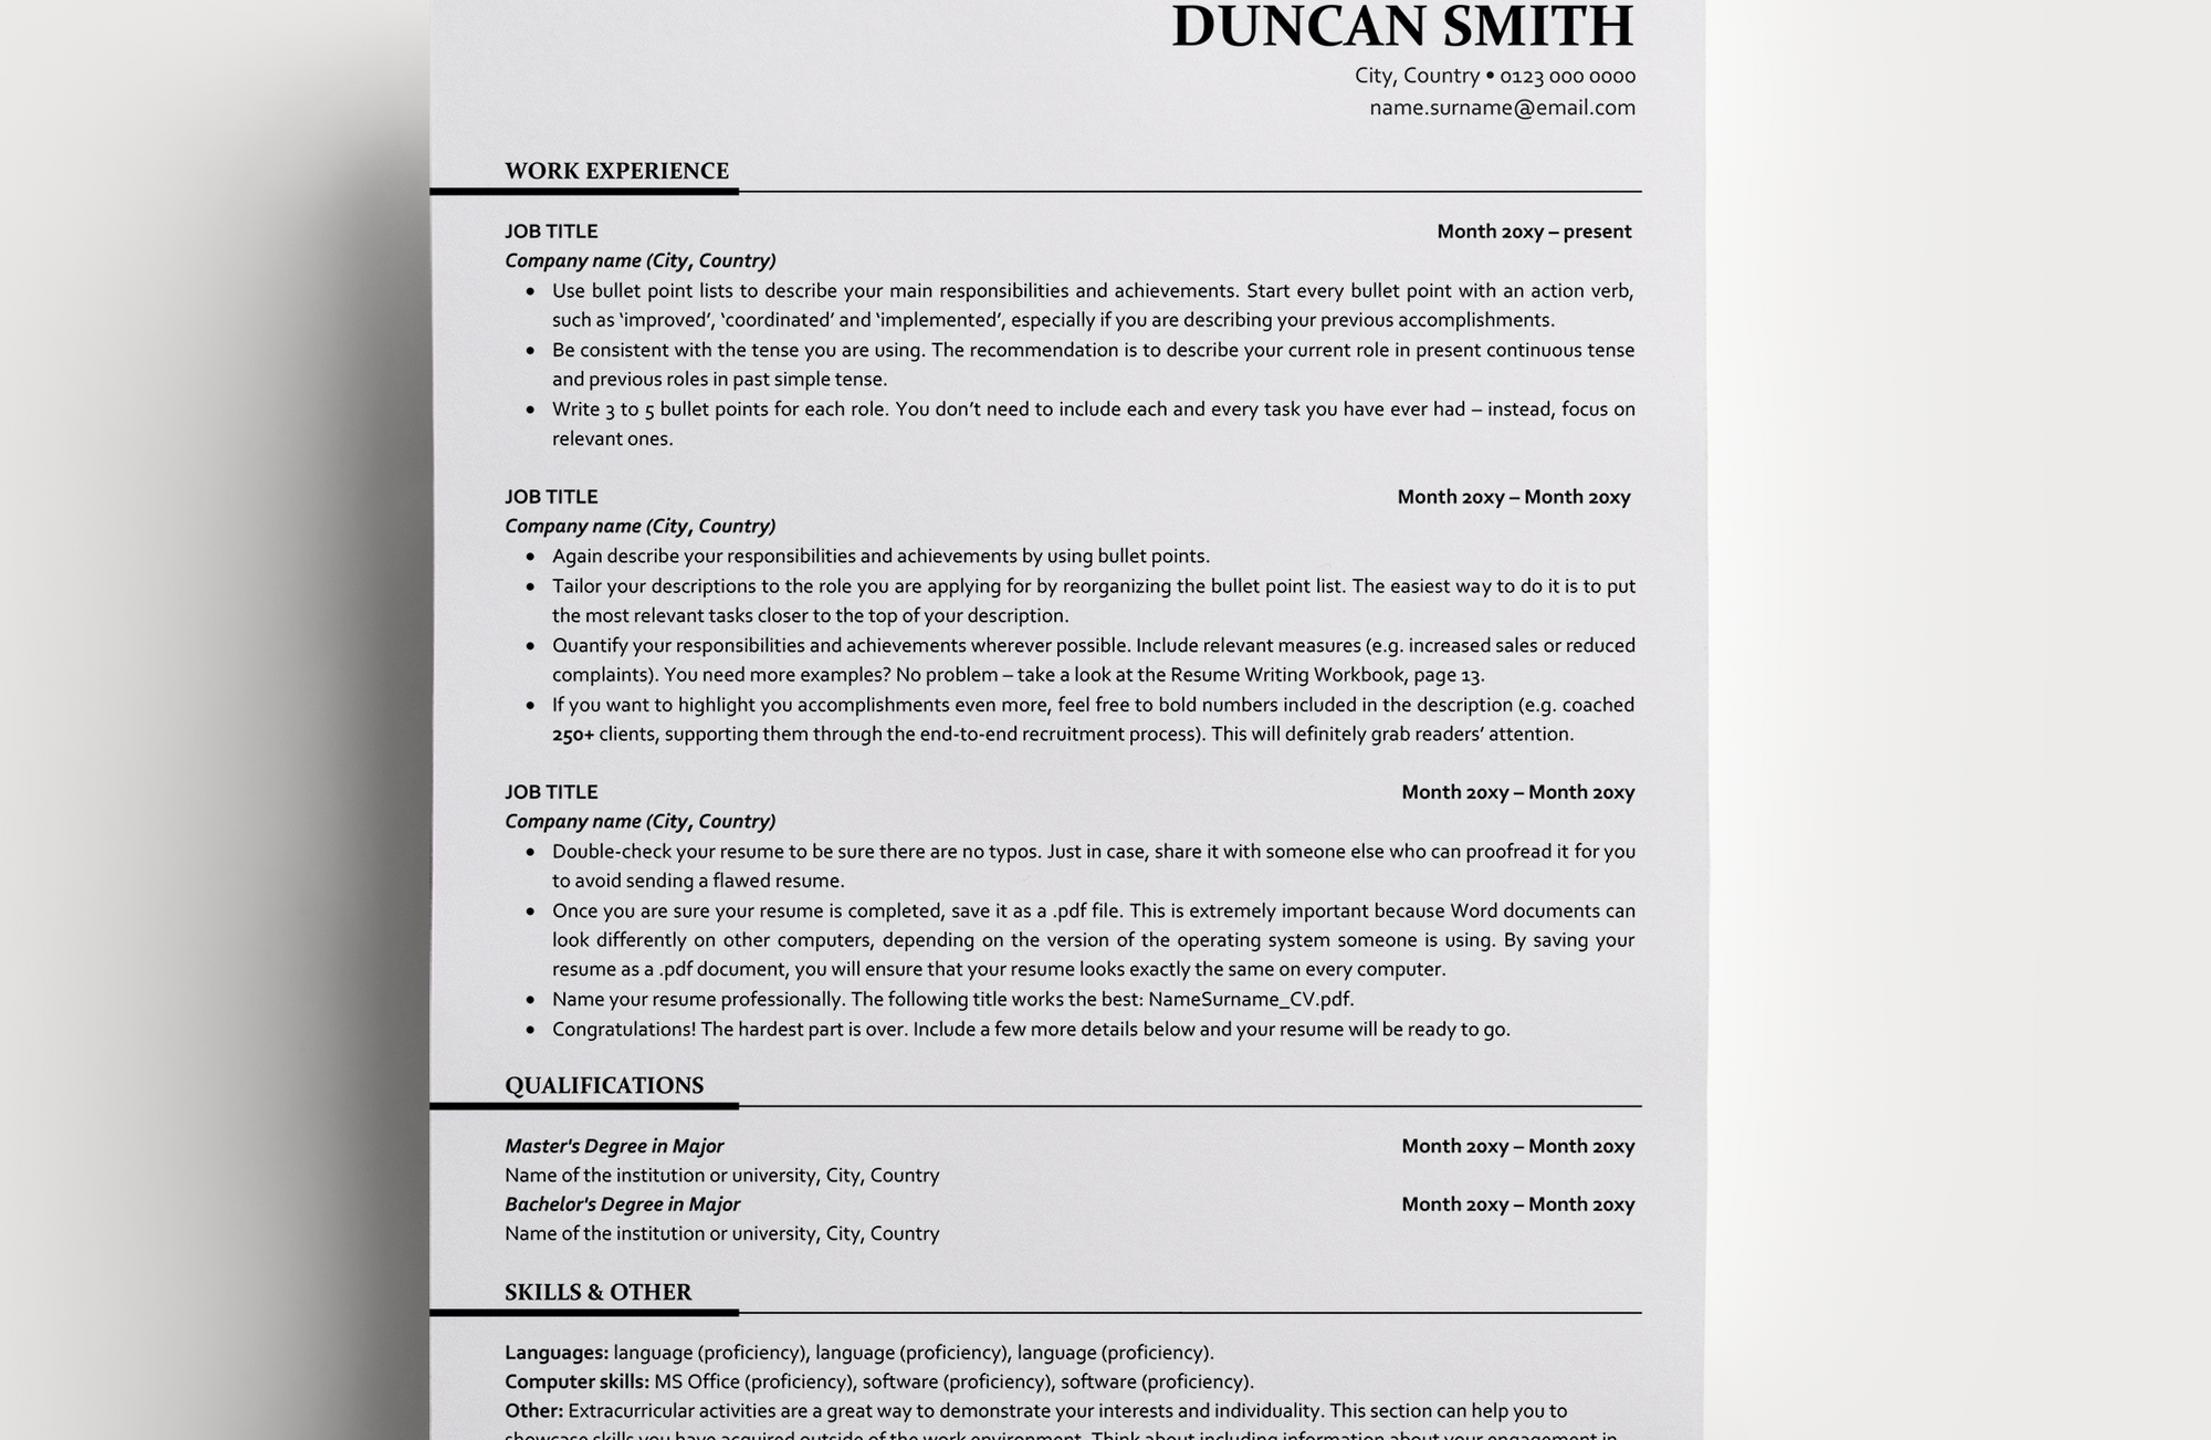 Resume Template Duncan